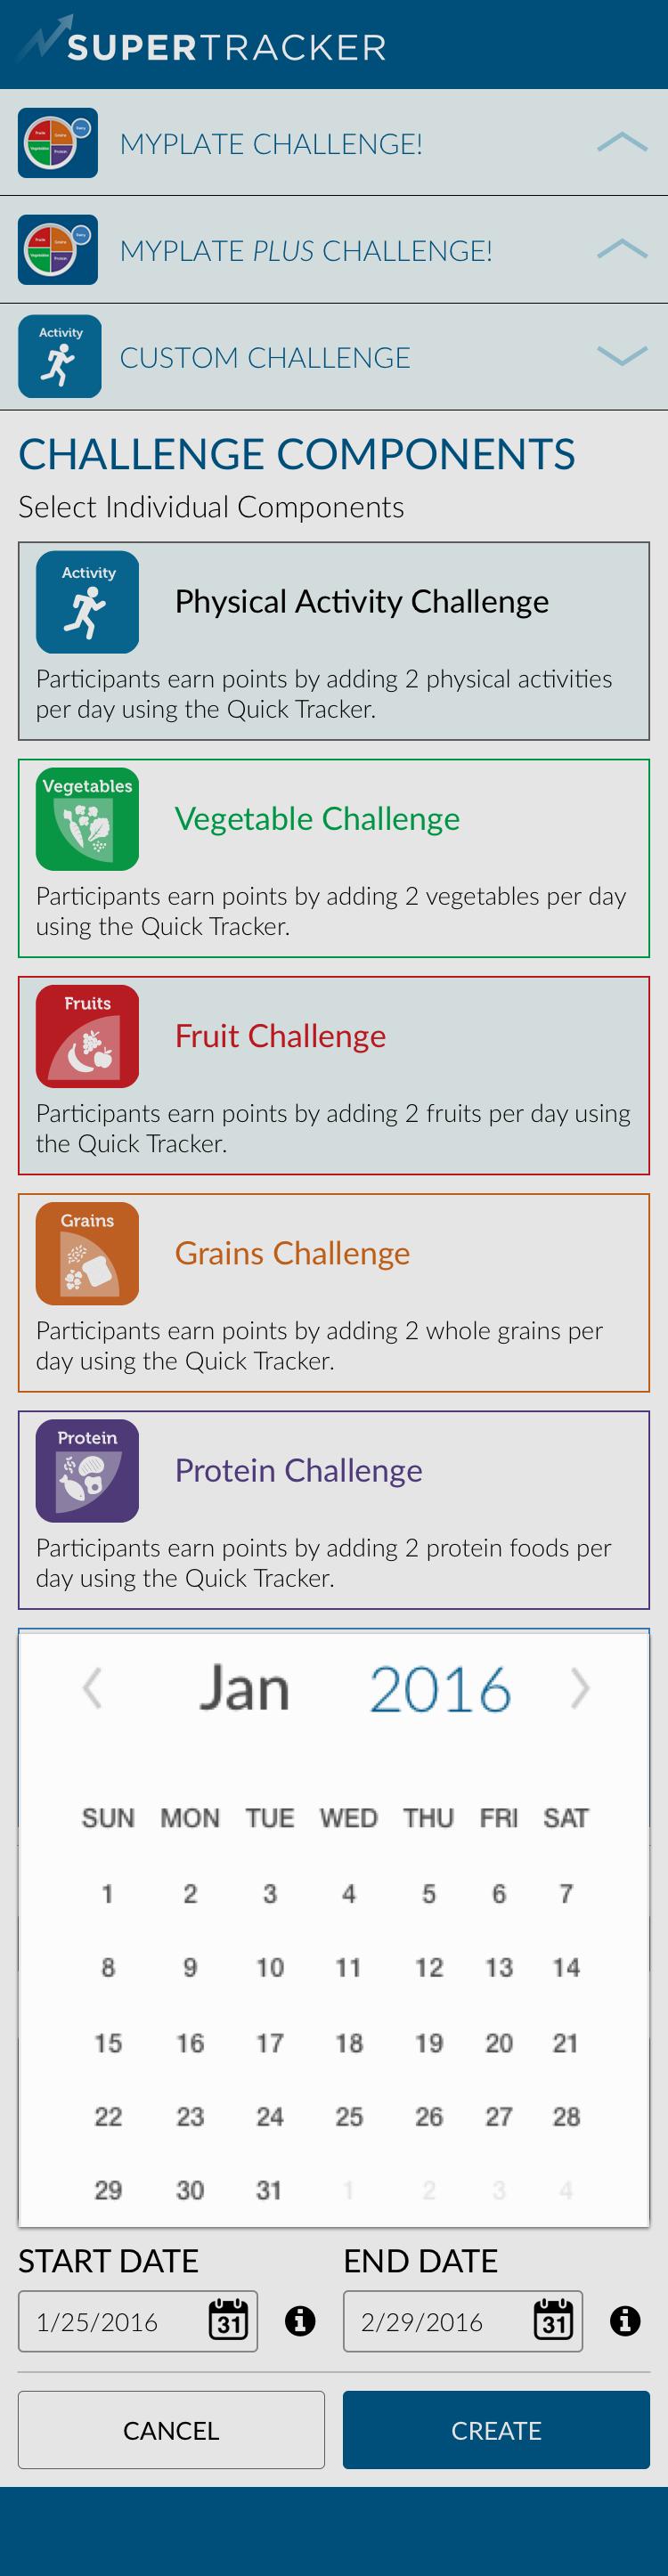 Custom Challenge - Components > Calendar Picker